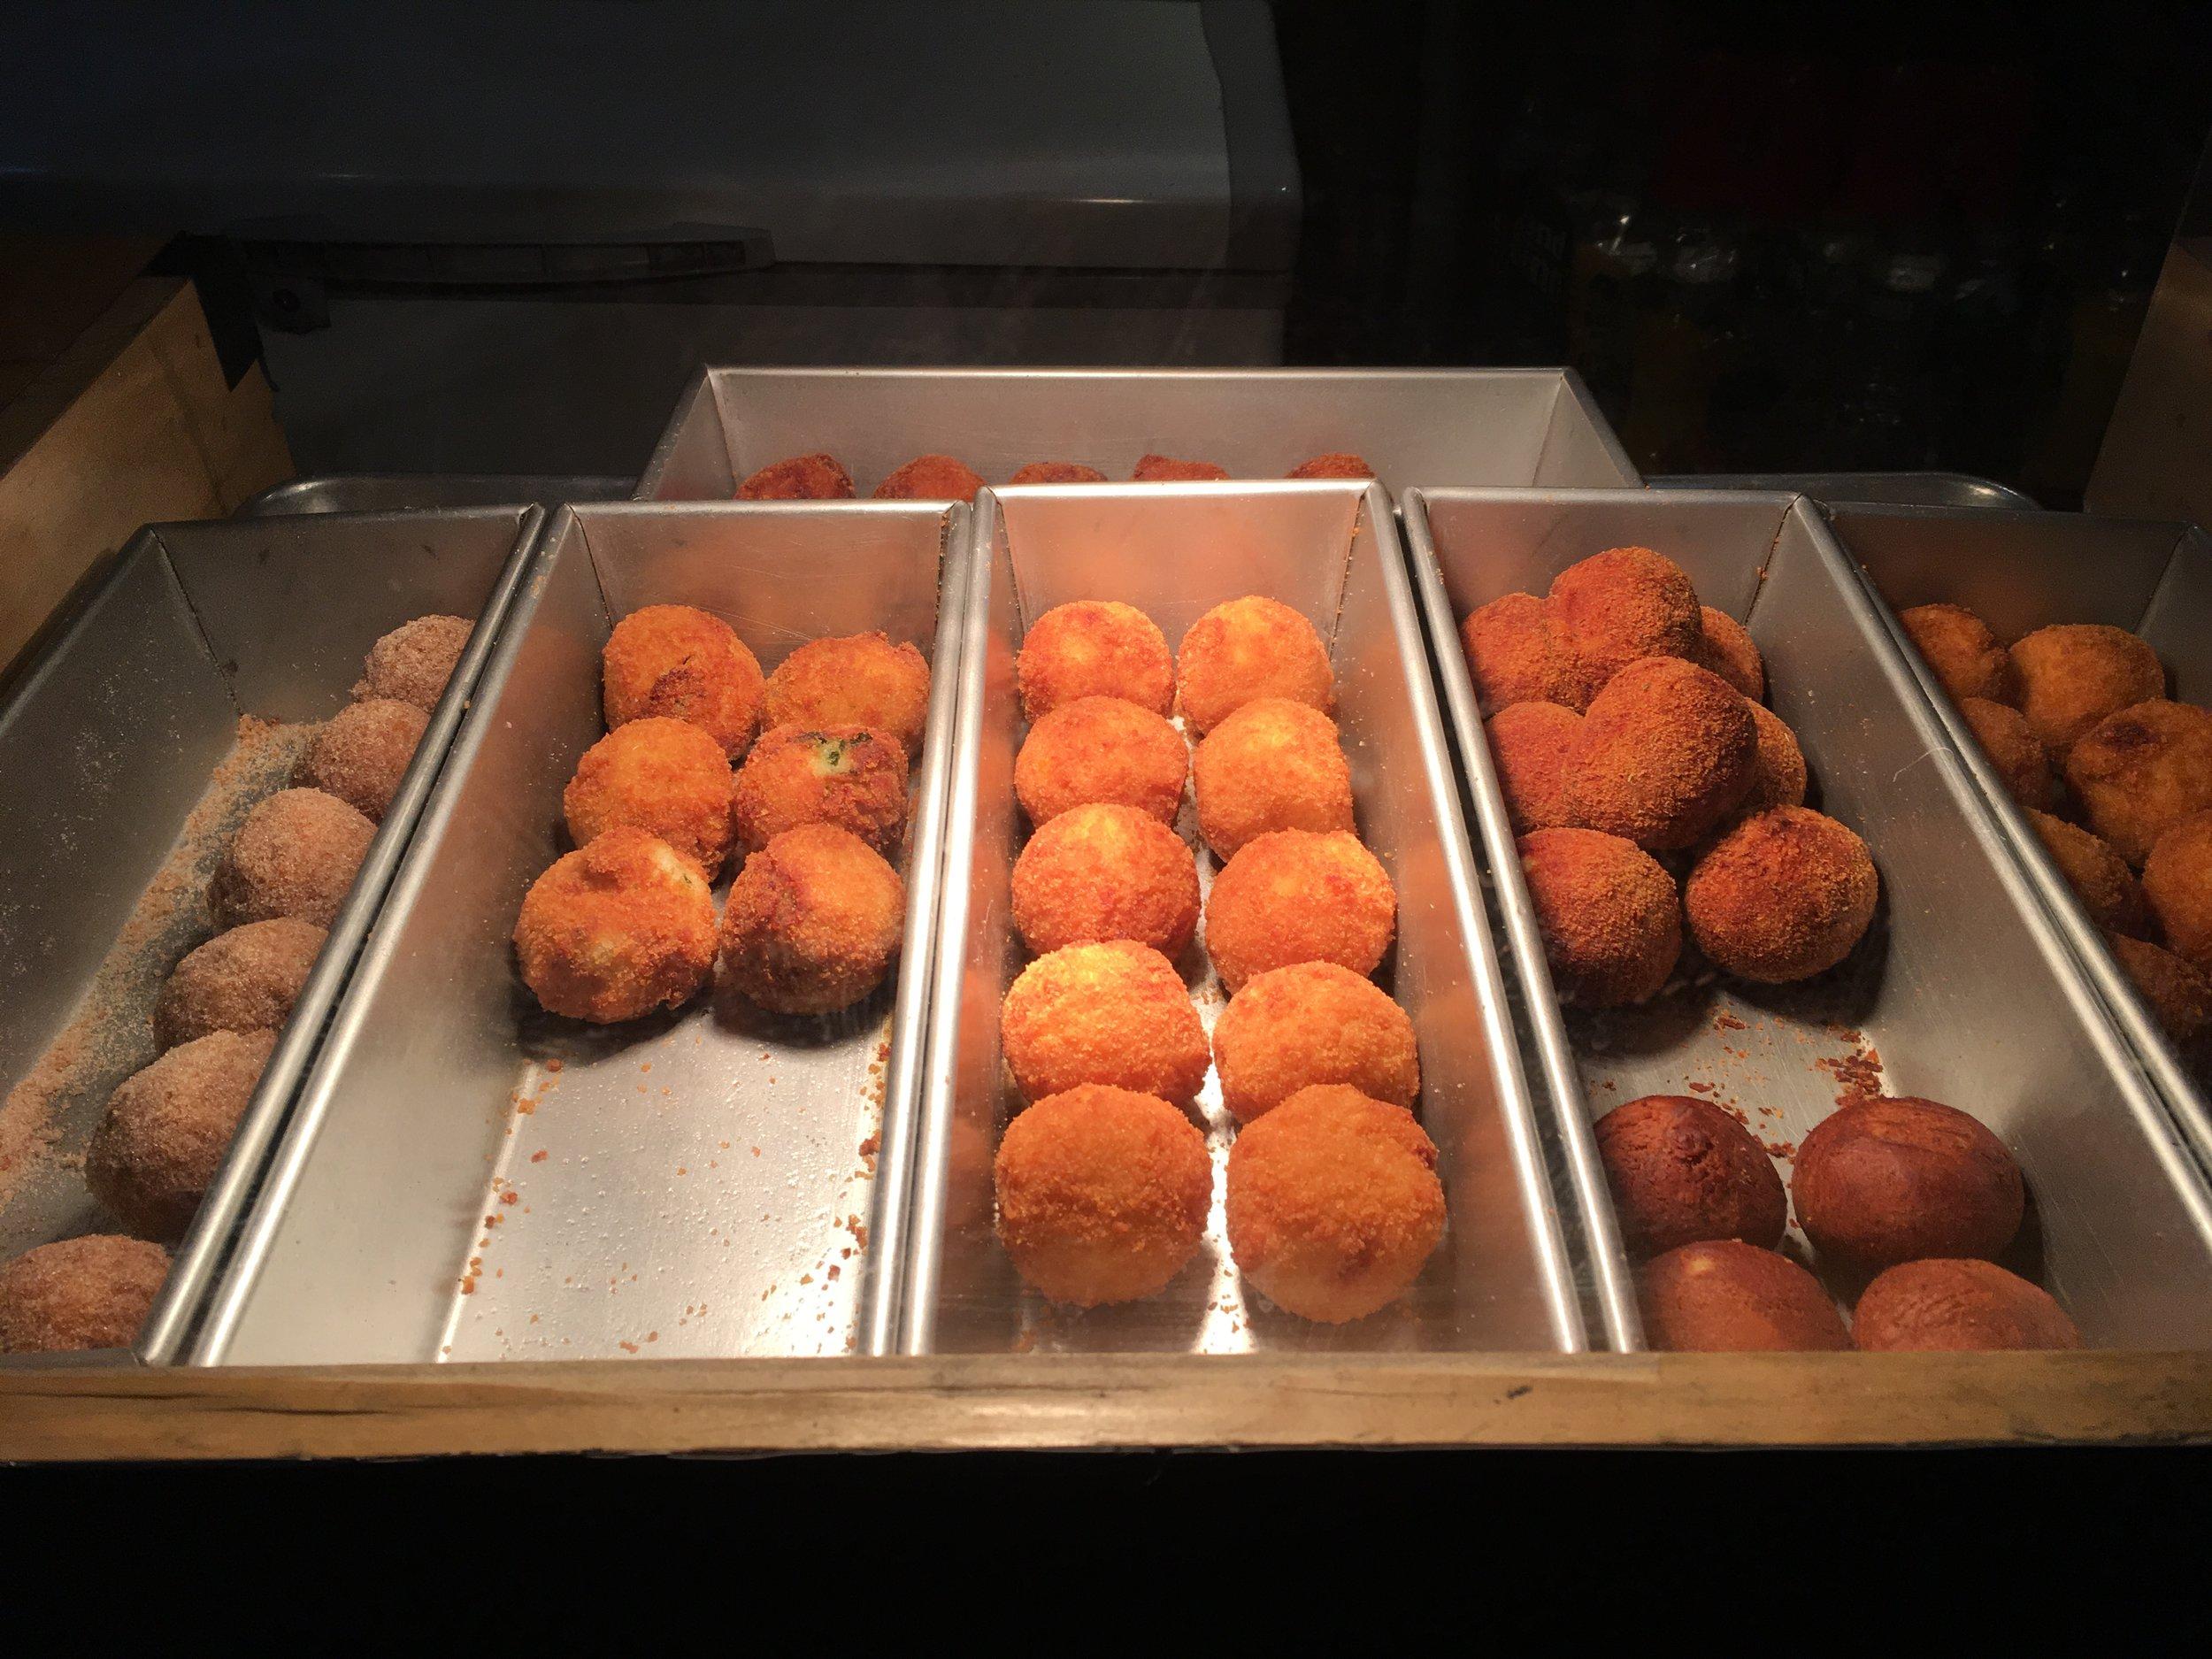 They've got balls!